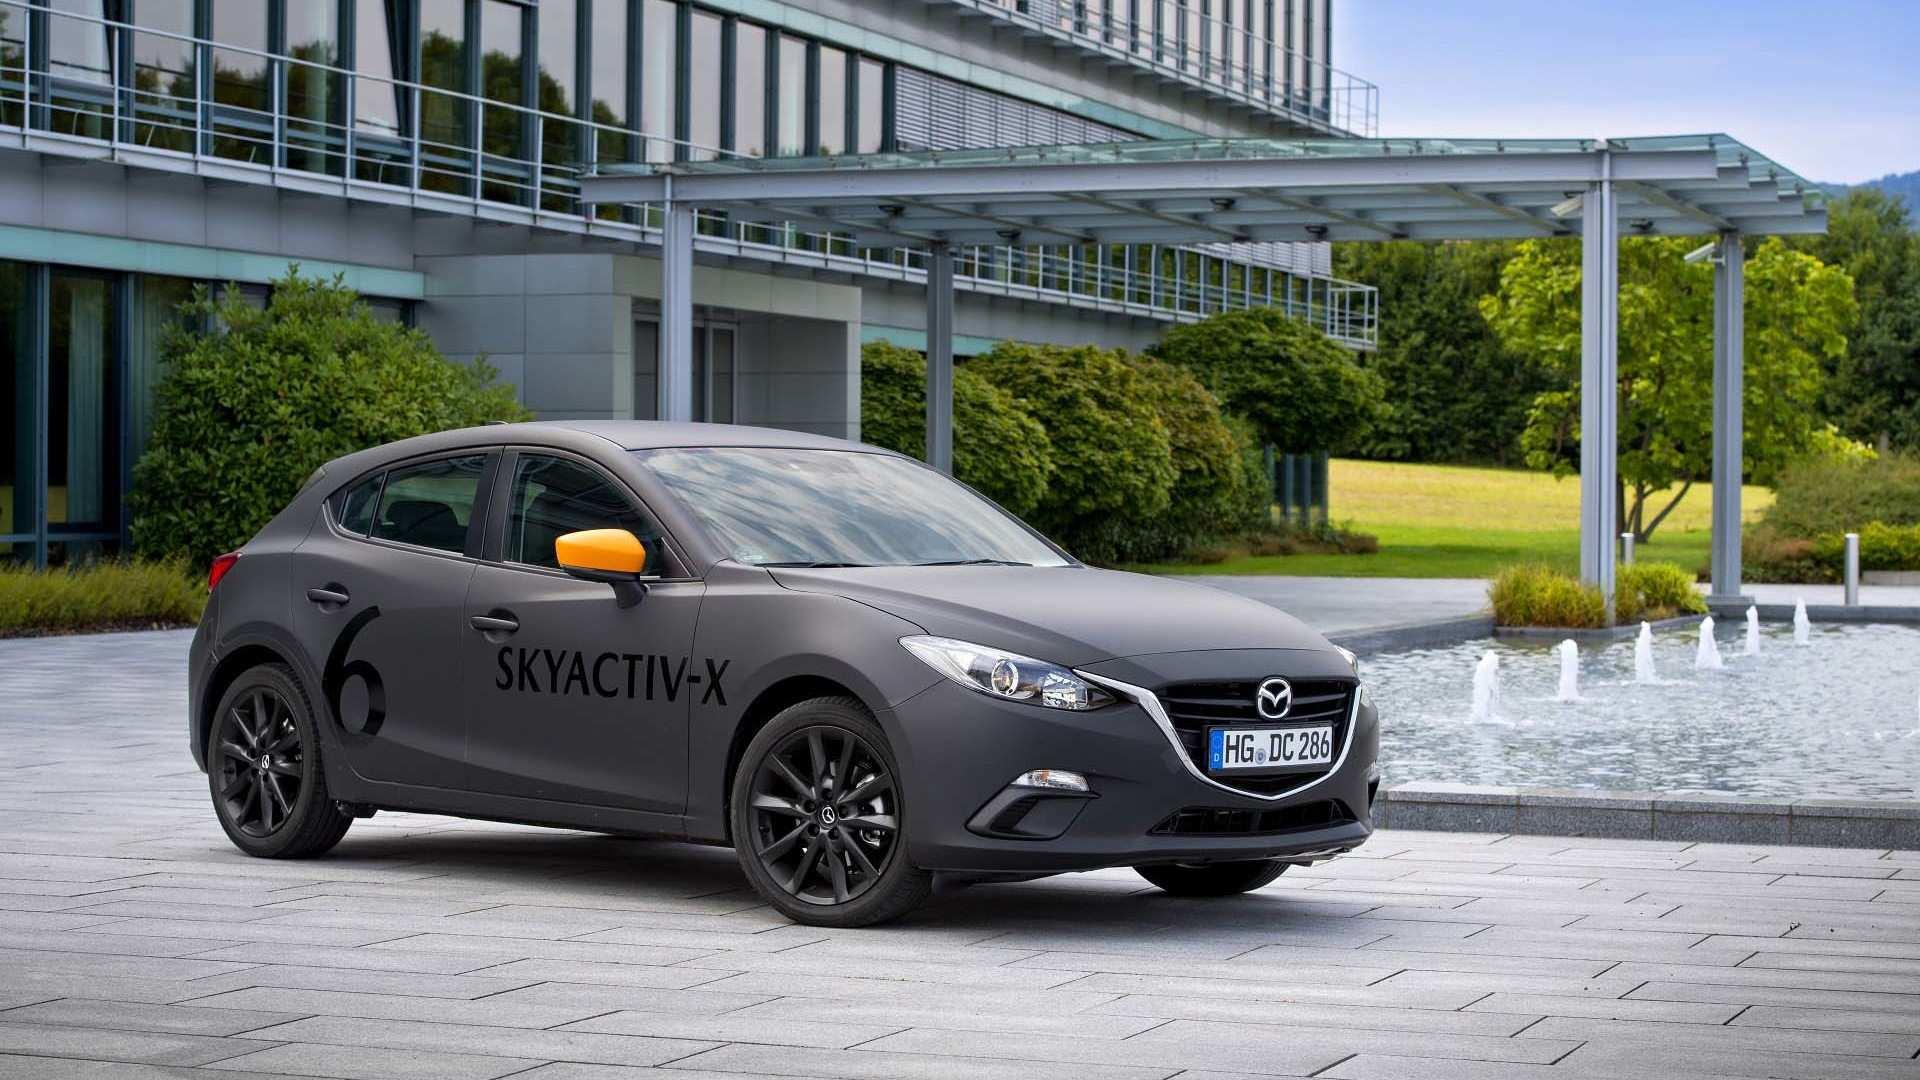 79 New Mazda Skyactiv 2020 Performance and New Engine with Mazda Skyactiv 2020